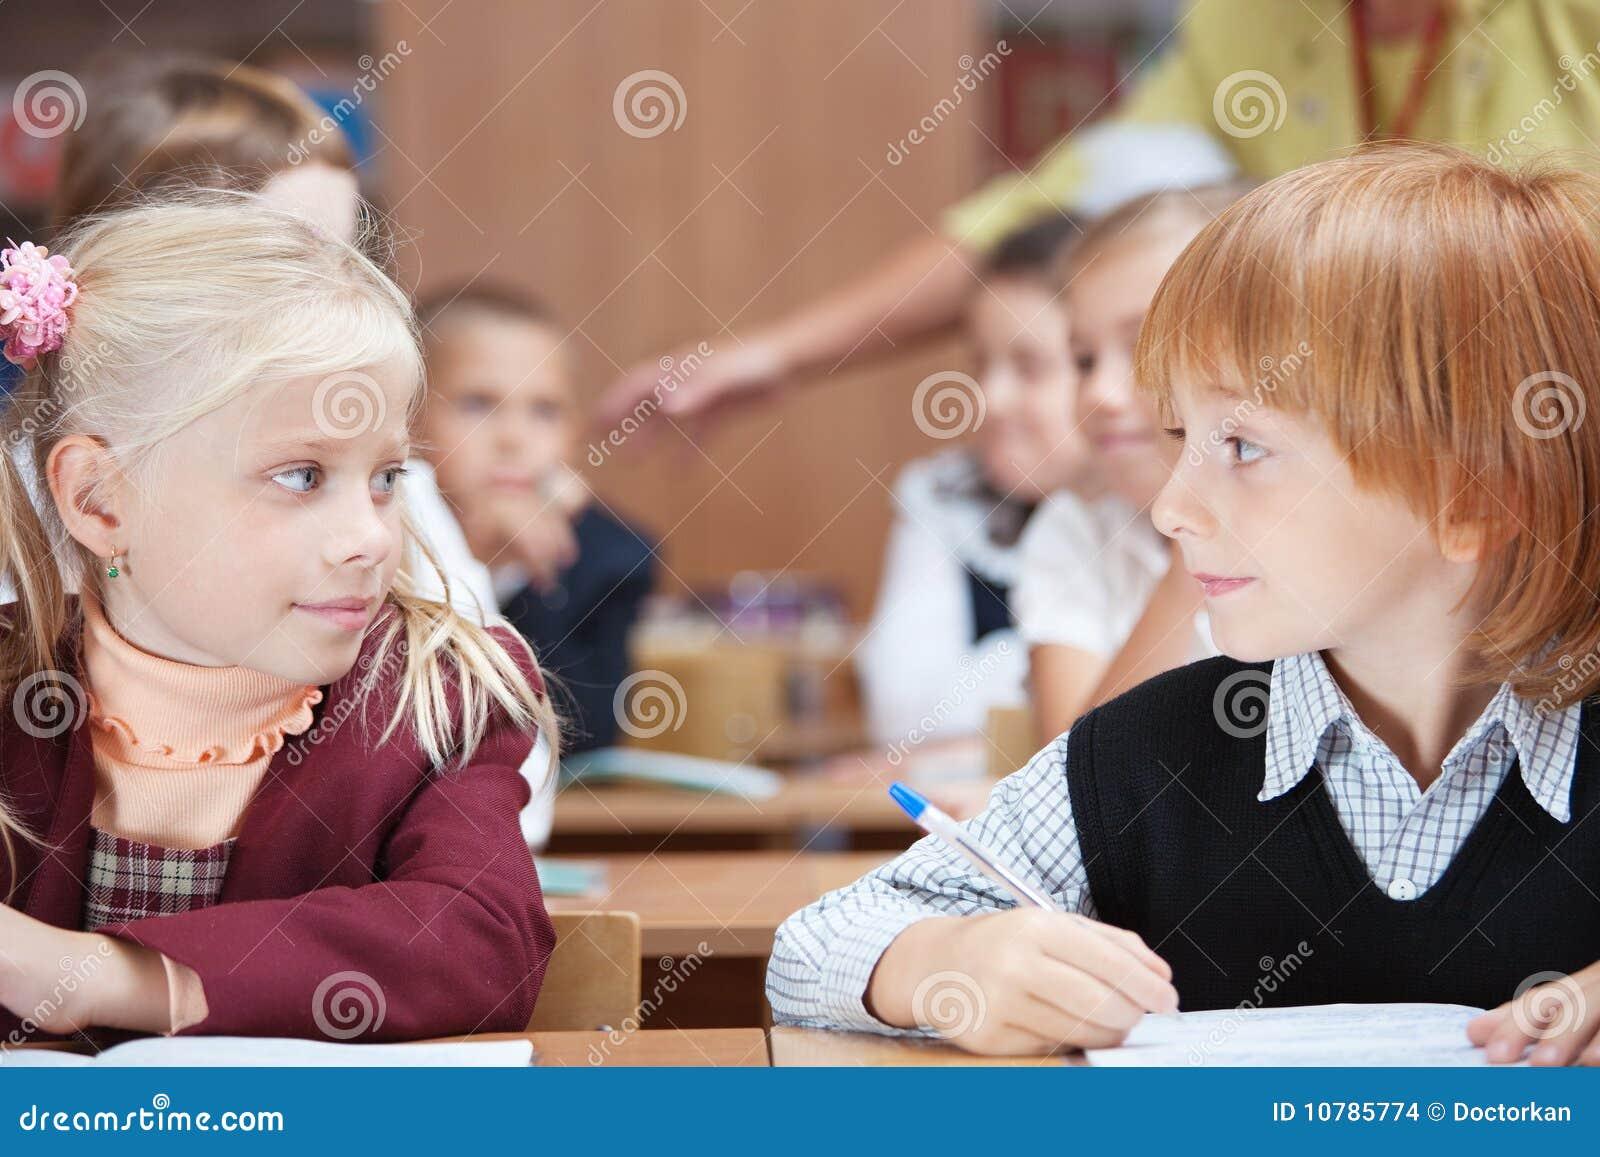 First School love